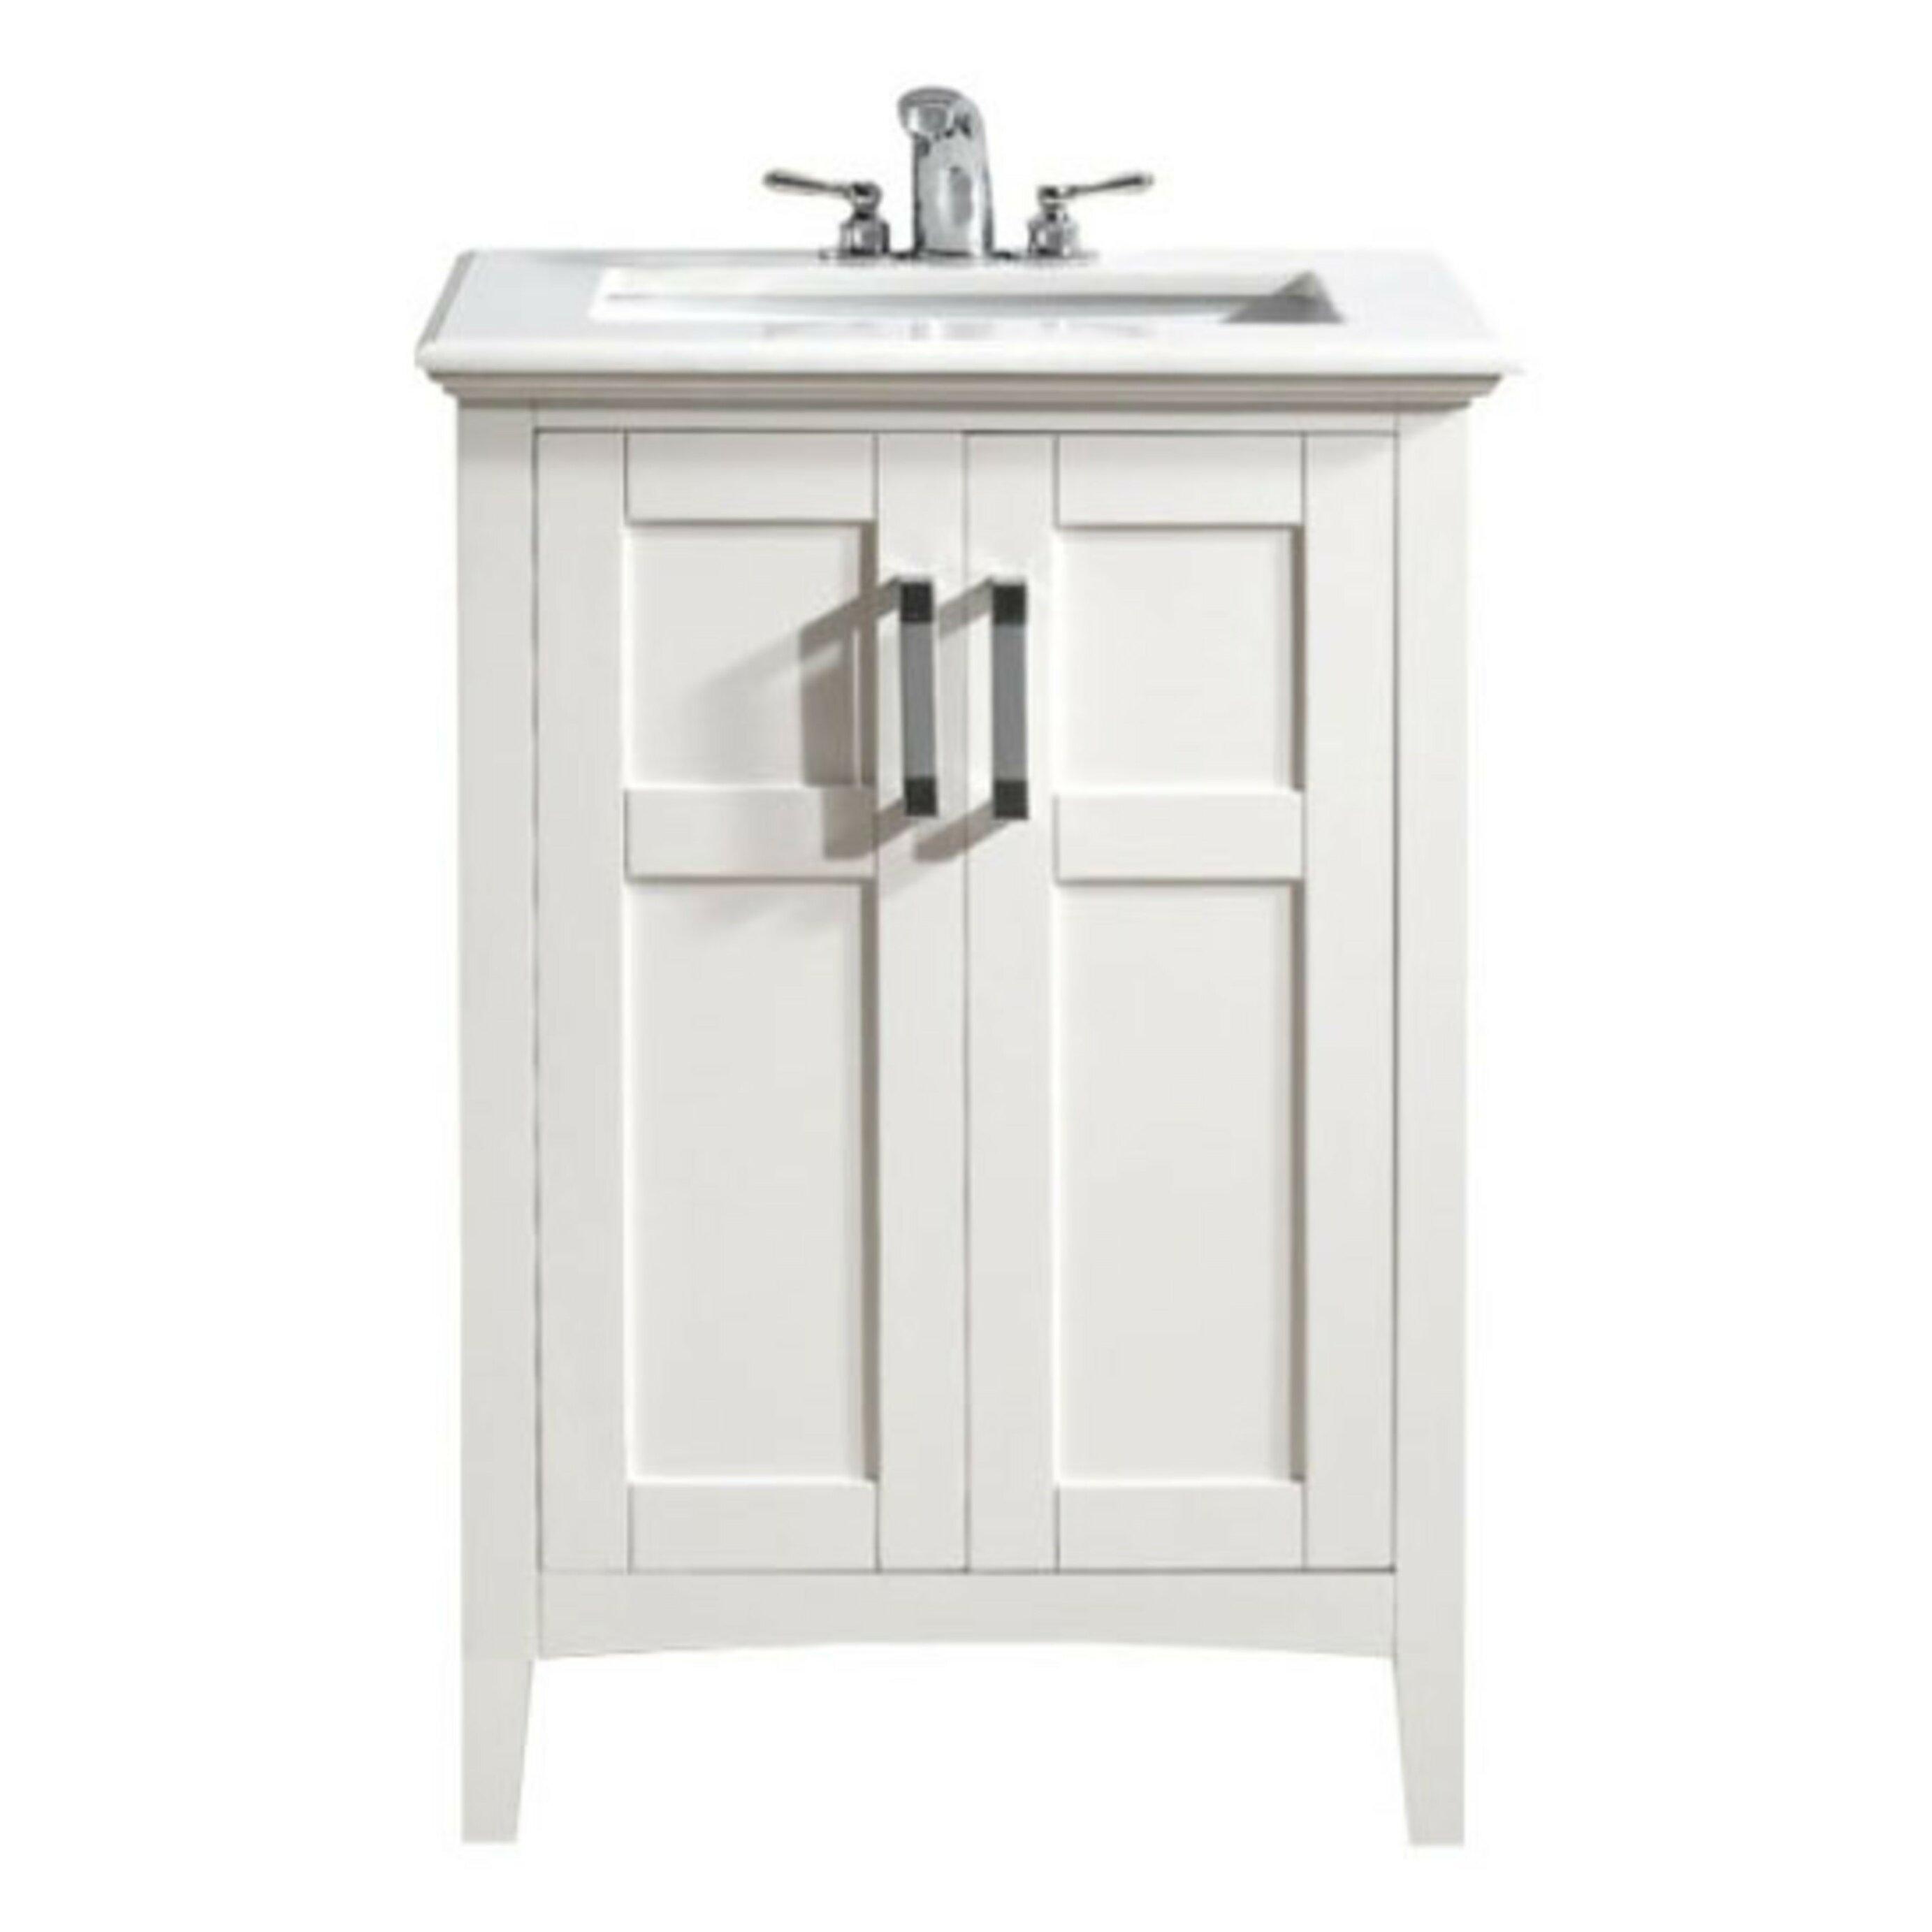 Simpli Home Winston 24 Single Bathroom Vanity Set Reviews Wayfair .